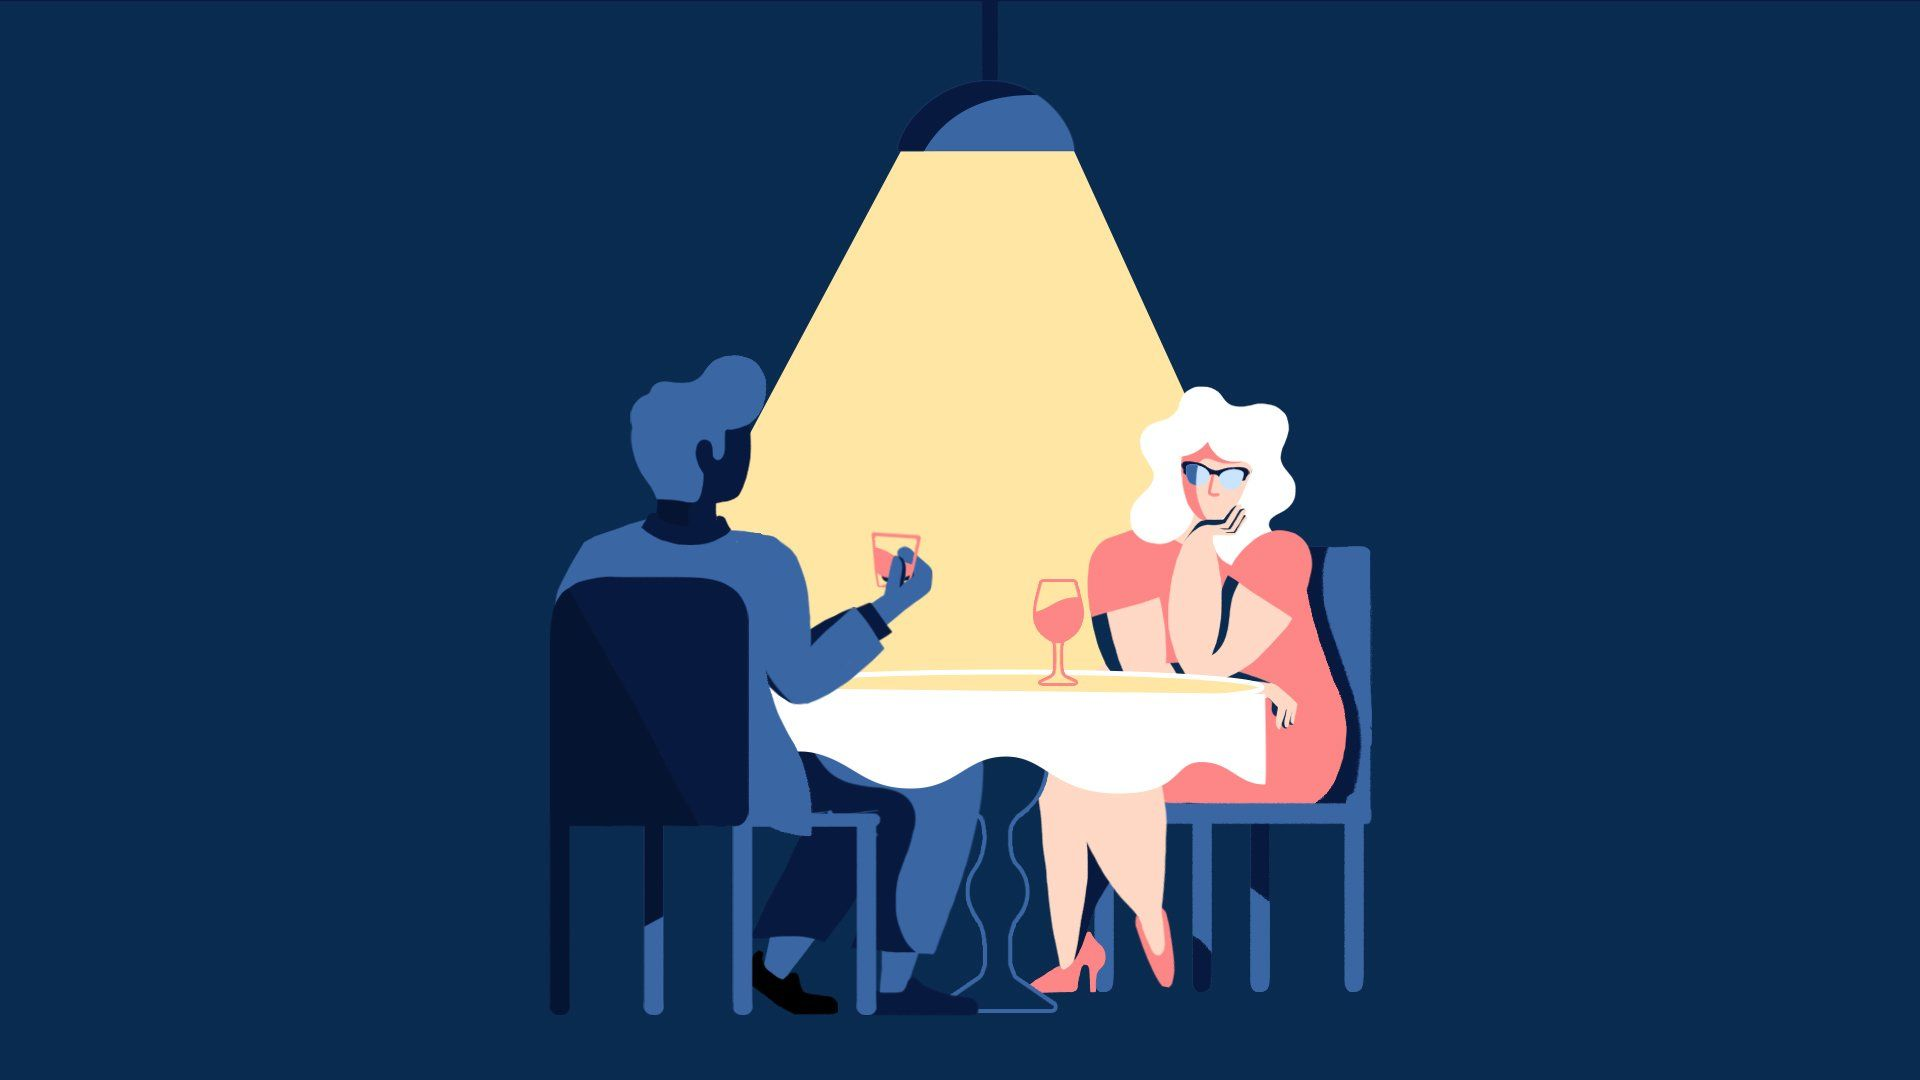 New York Times Modern Love Animation Modern Love Character Design